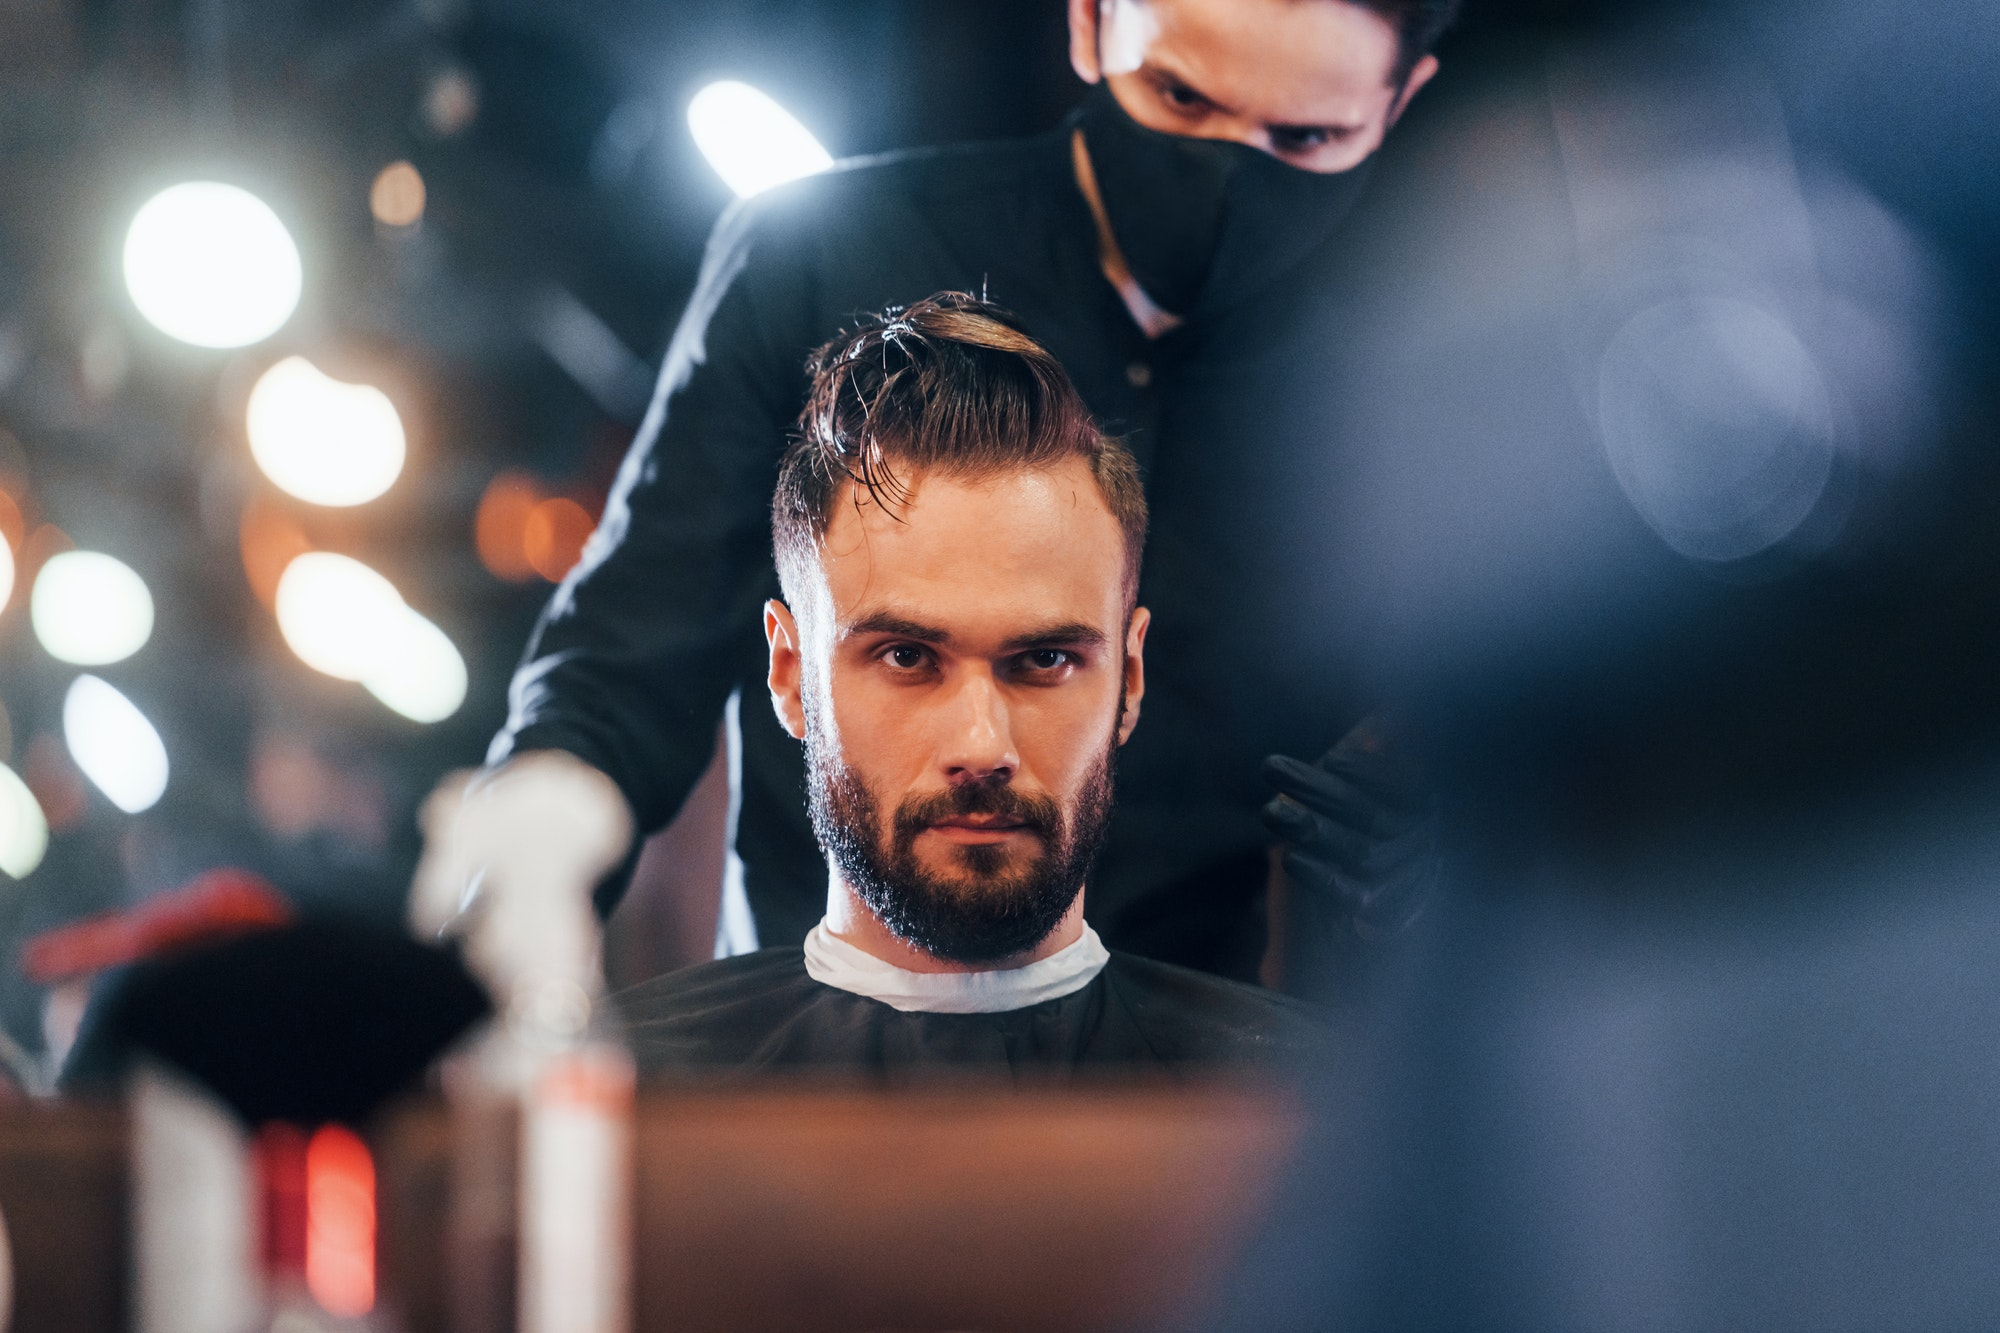 Young stylish man sitting in barbershop